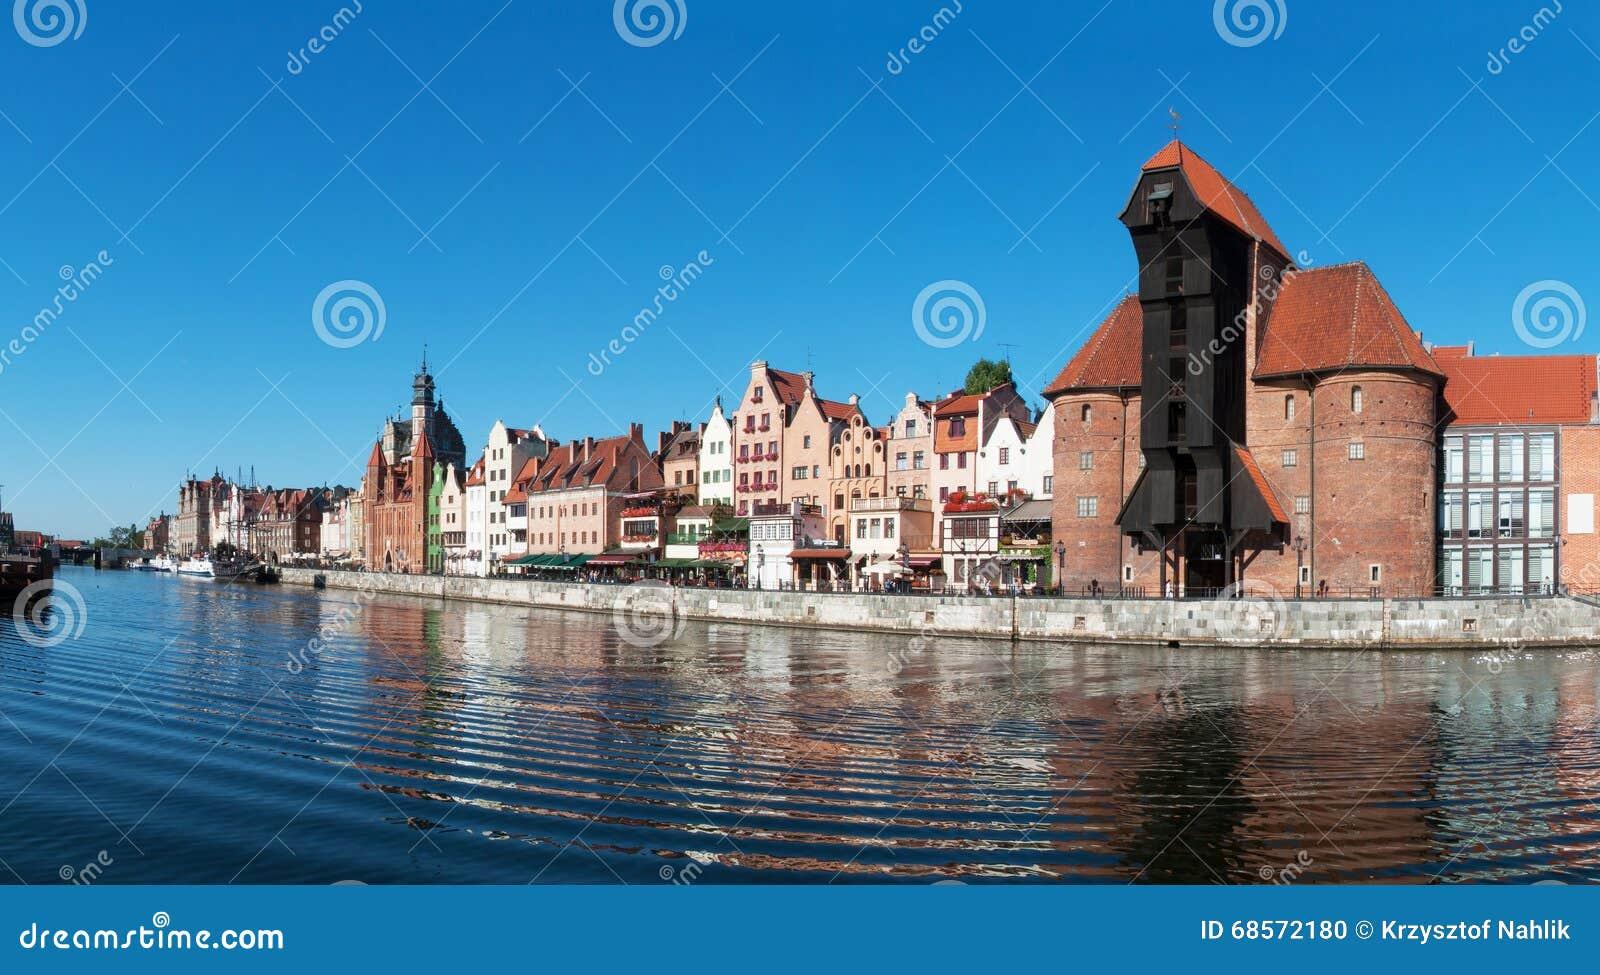 Gdansk old city panorama, Poland